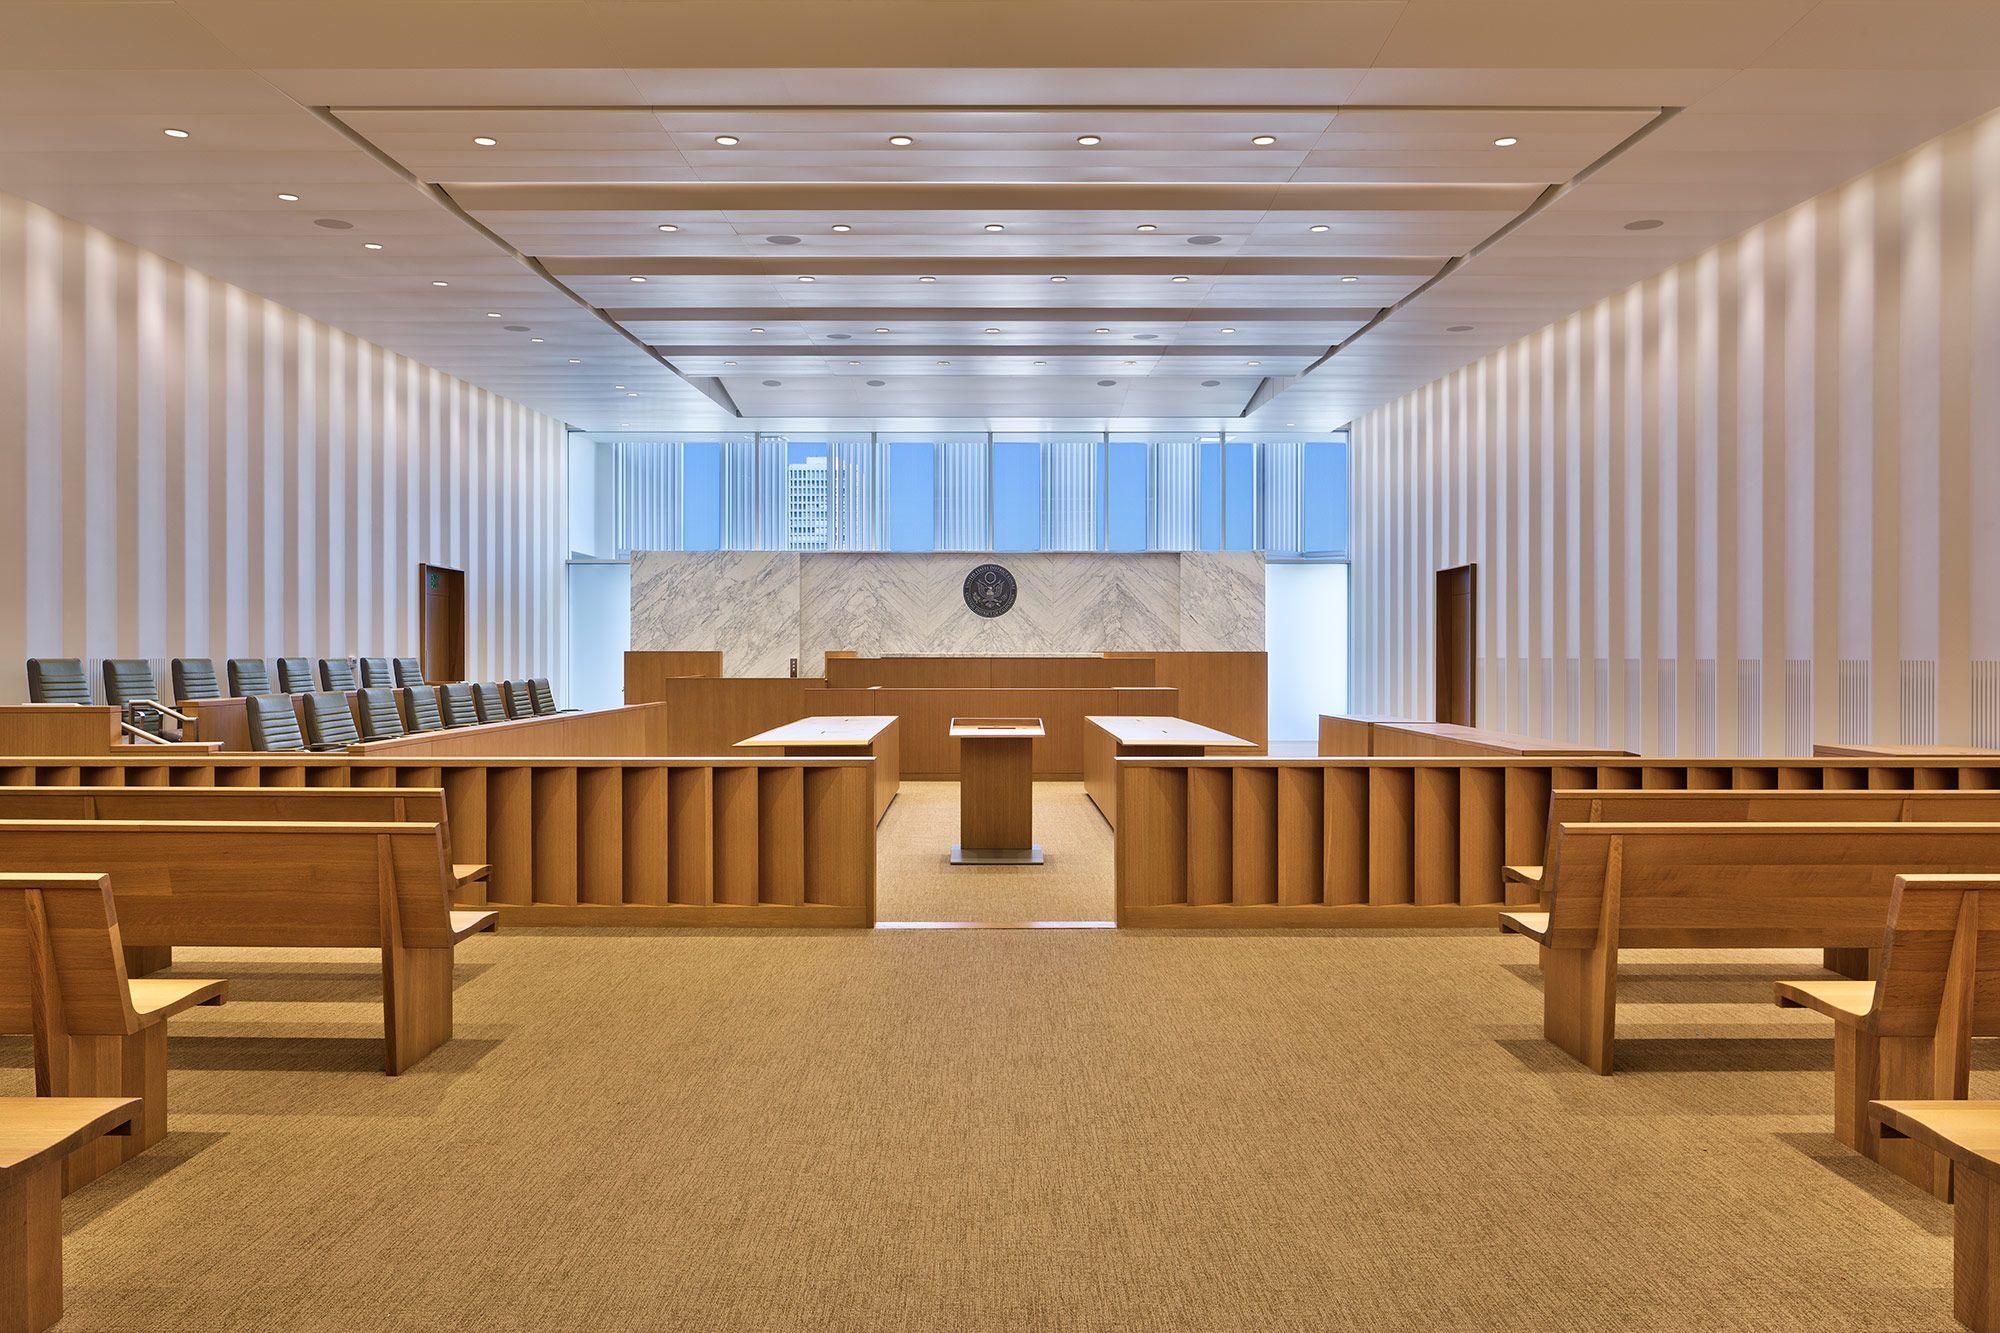 La Som Courtroom Court Jpg 2000 1333 Supreme Court Building Courthouse Workspace Inspiration